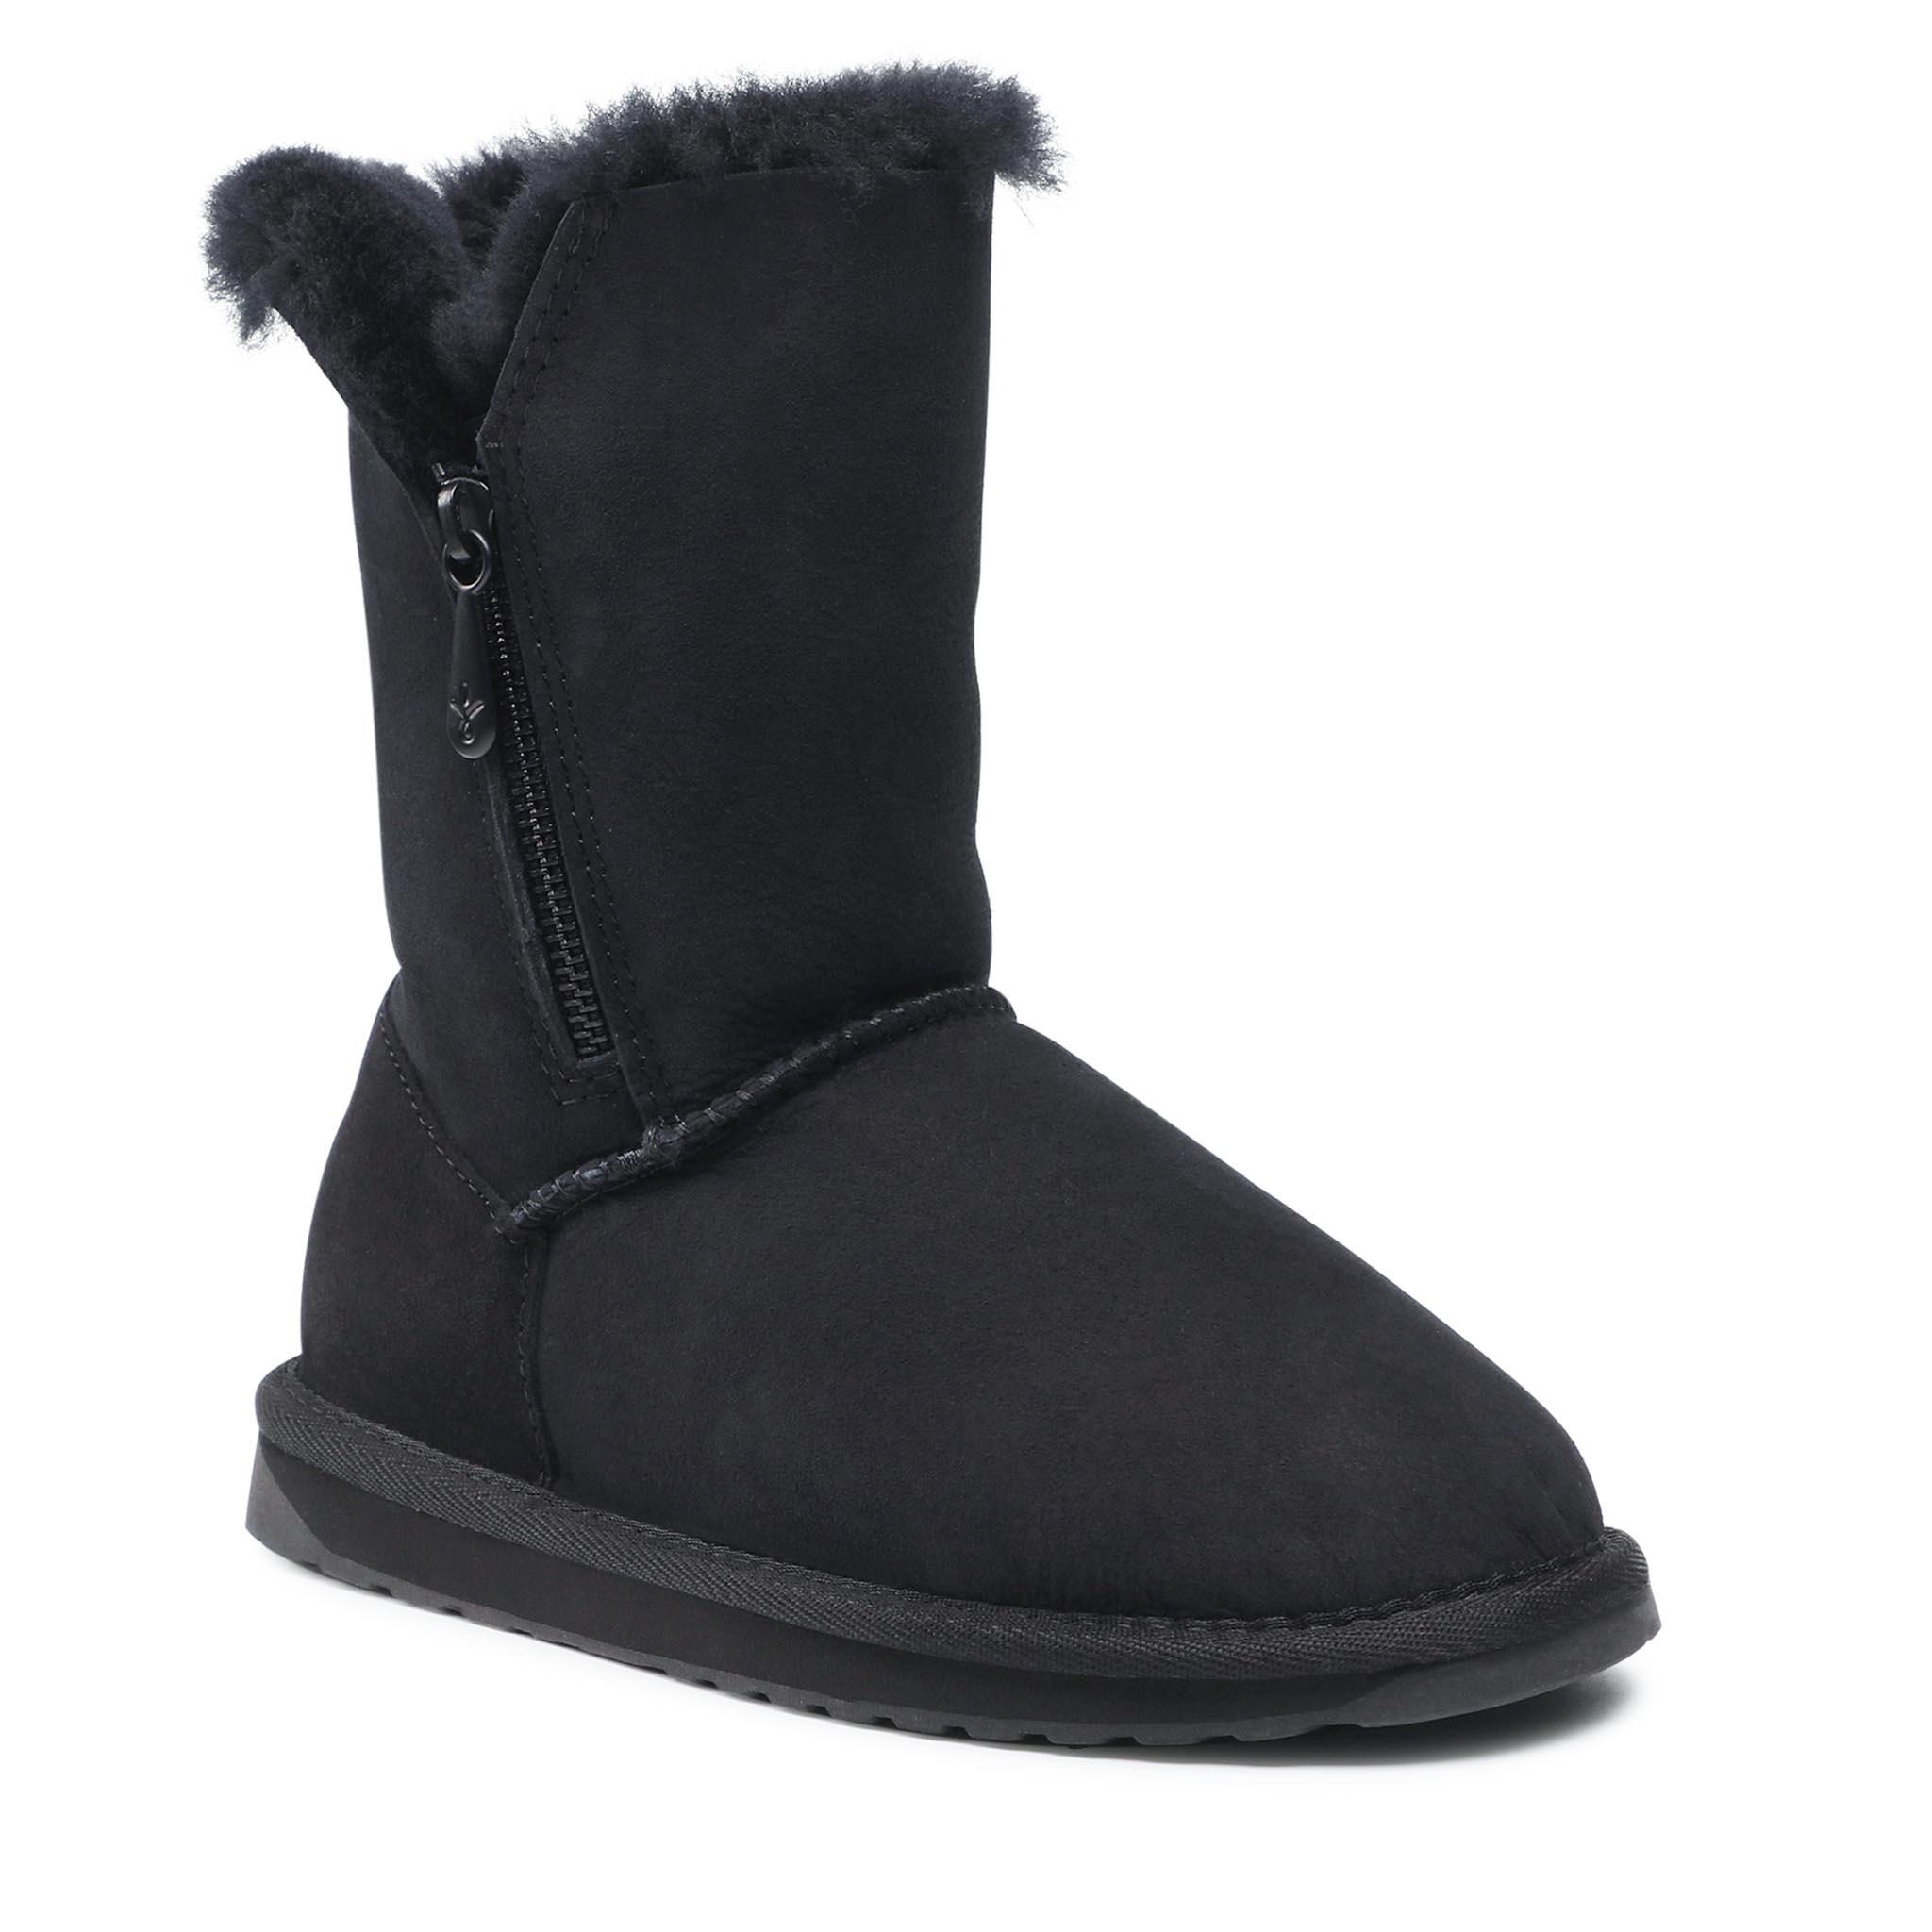 Image of Schuhe EMU AUSTRALIA - Ankaa W12615 Black